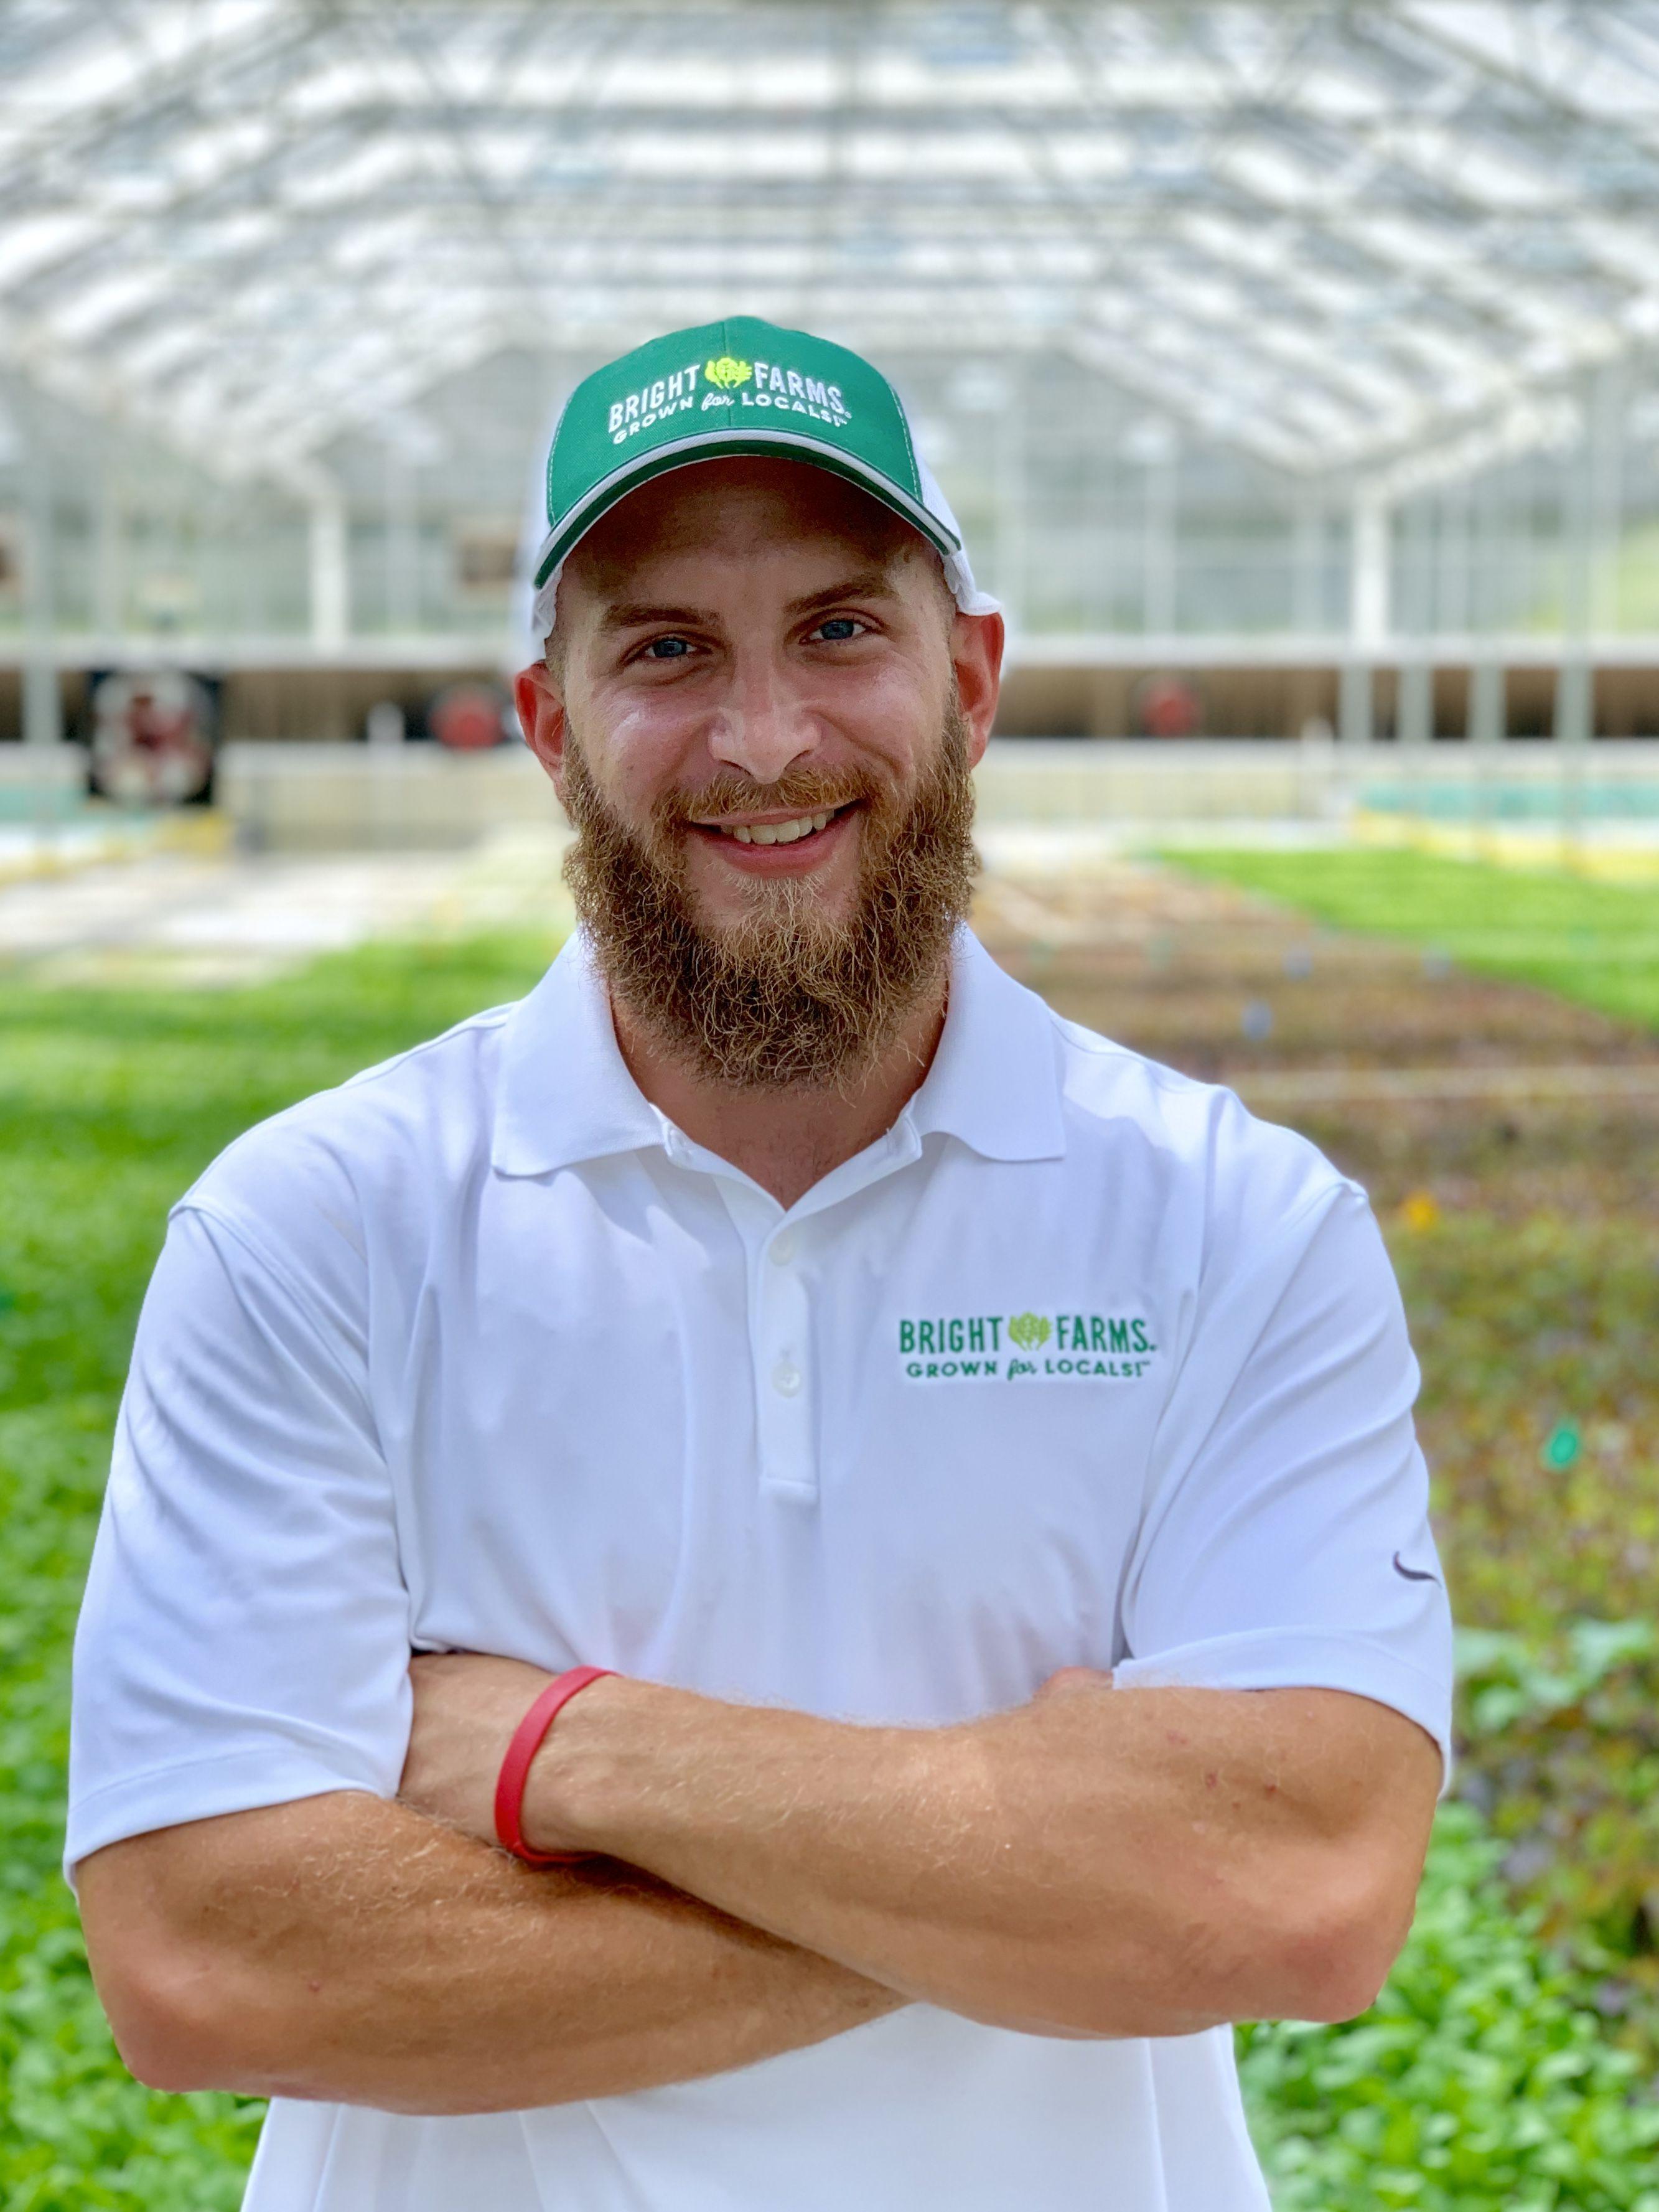 John Ballard Production Manager BrightFarms LMT Greenhouse